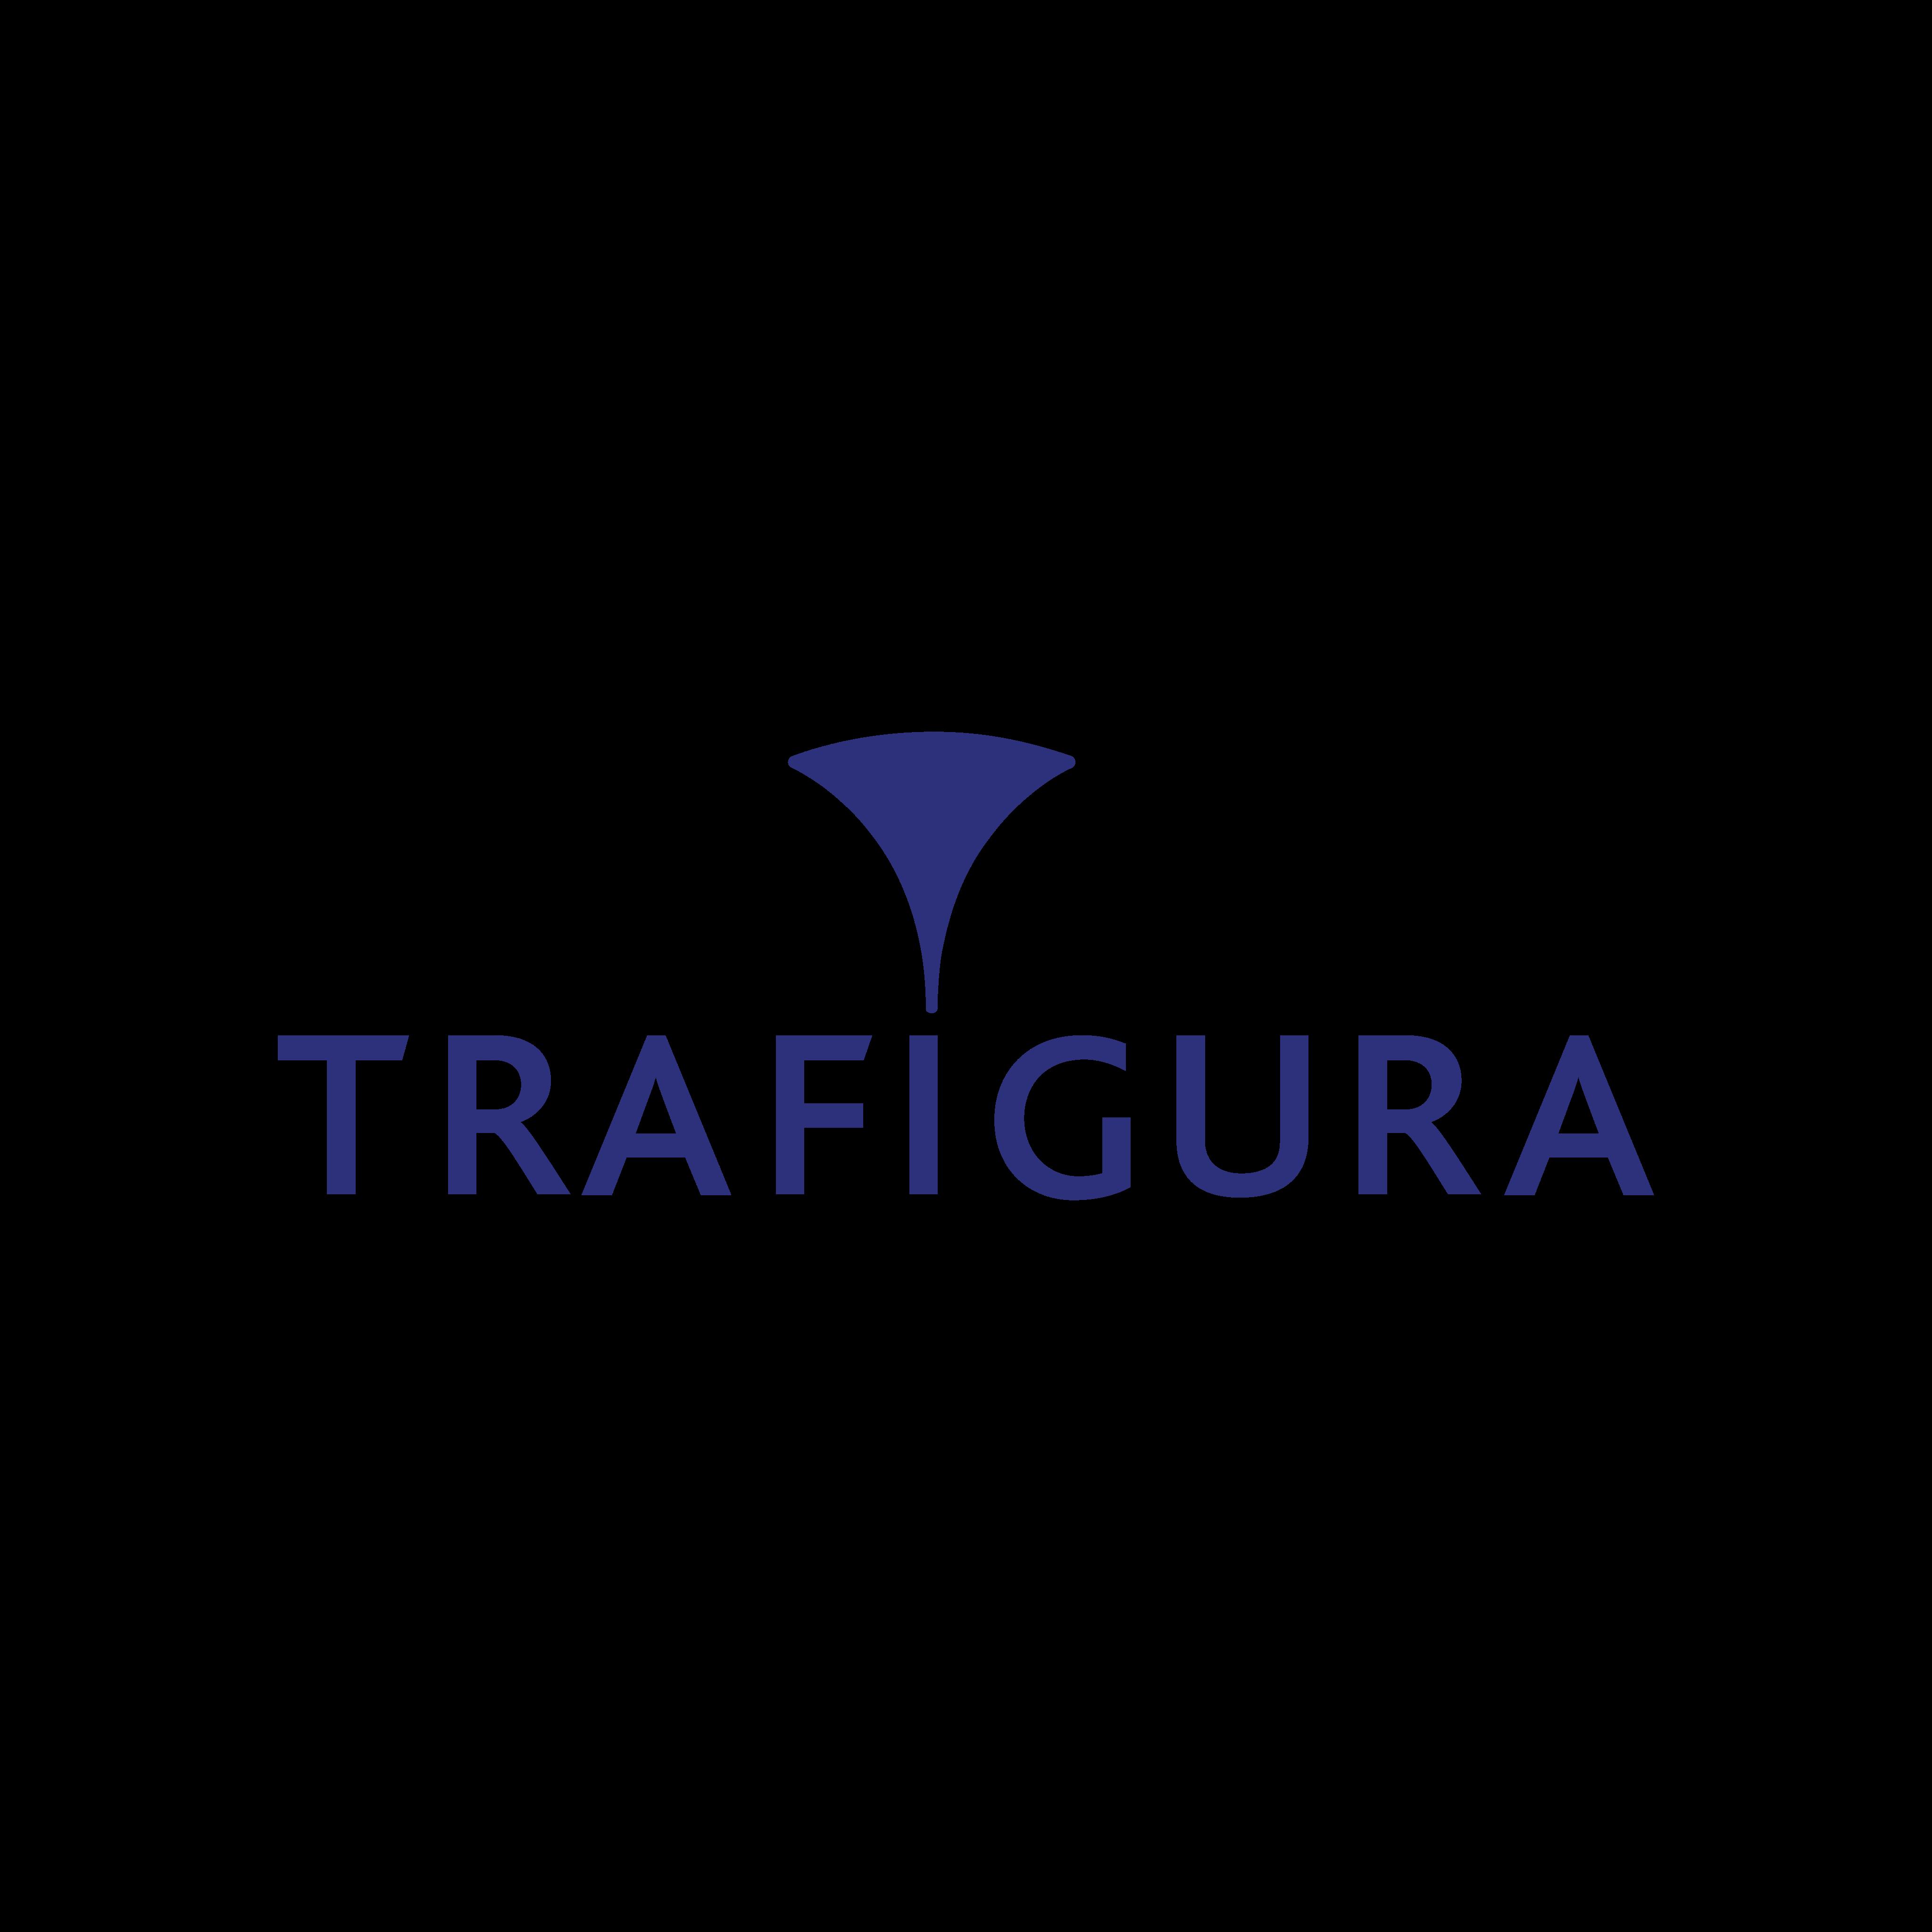 trafigura-logo-0